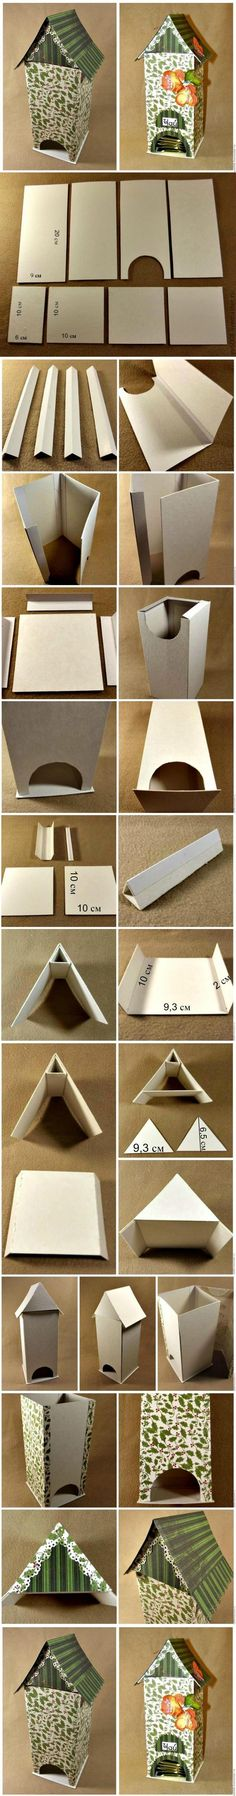 Shoebox Crafts : DIY Cardboard Tea Bag Dispenser www.nuvastgoed.nl